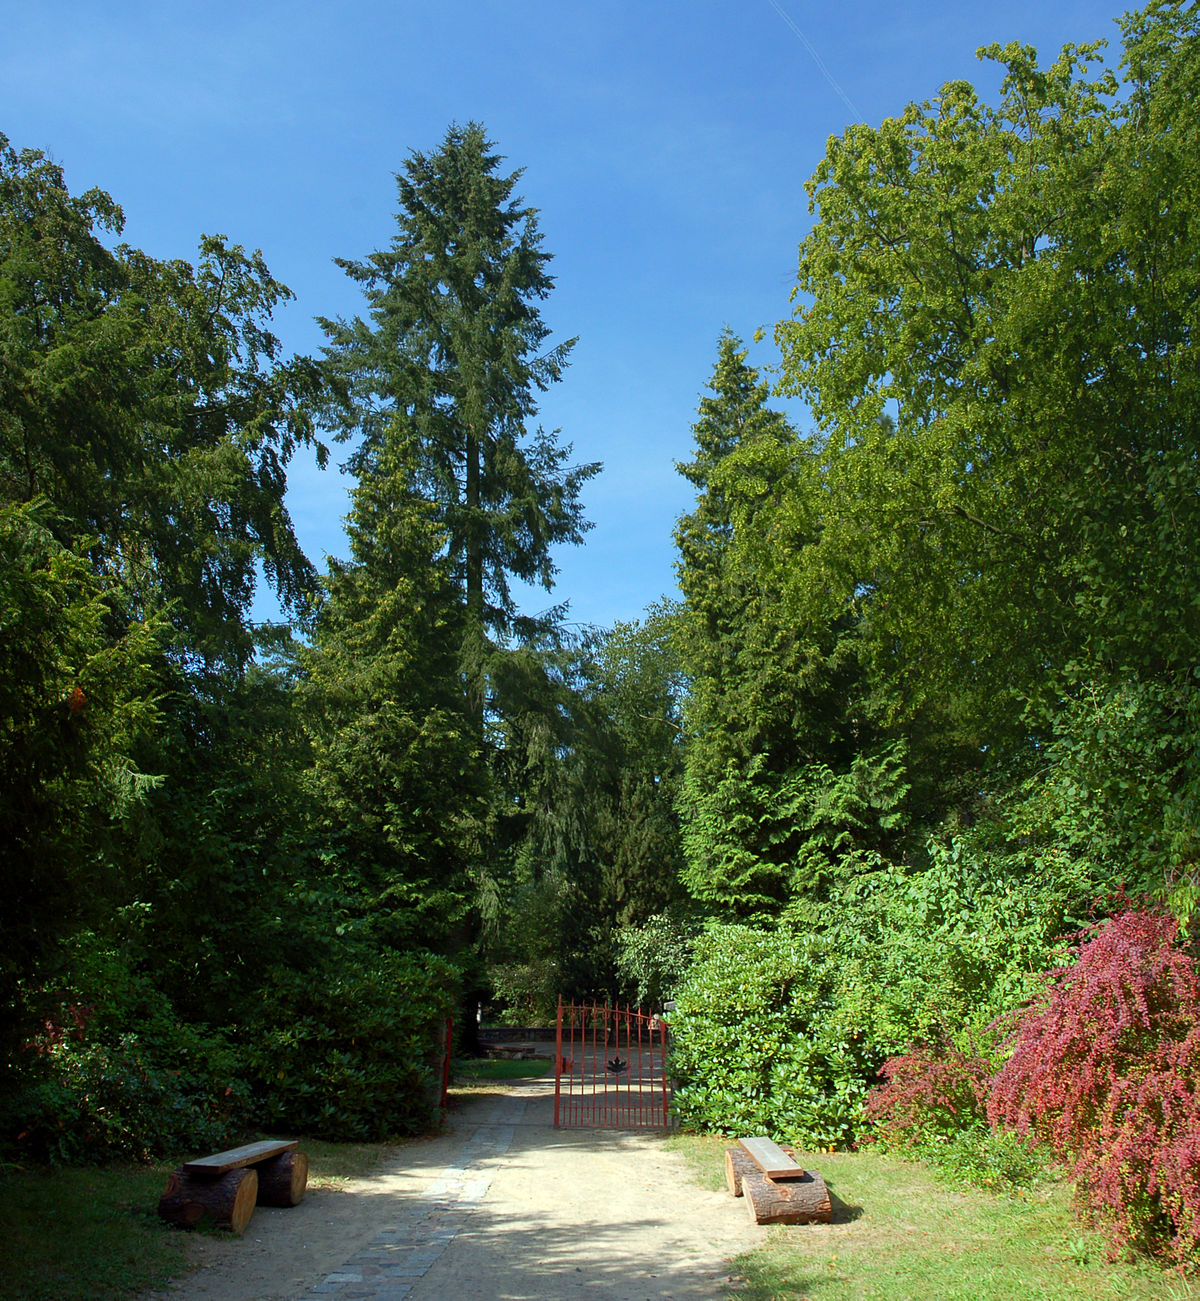 Forstbotanischer Garten Eberswalde  Wikipedia